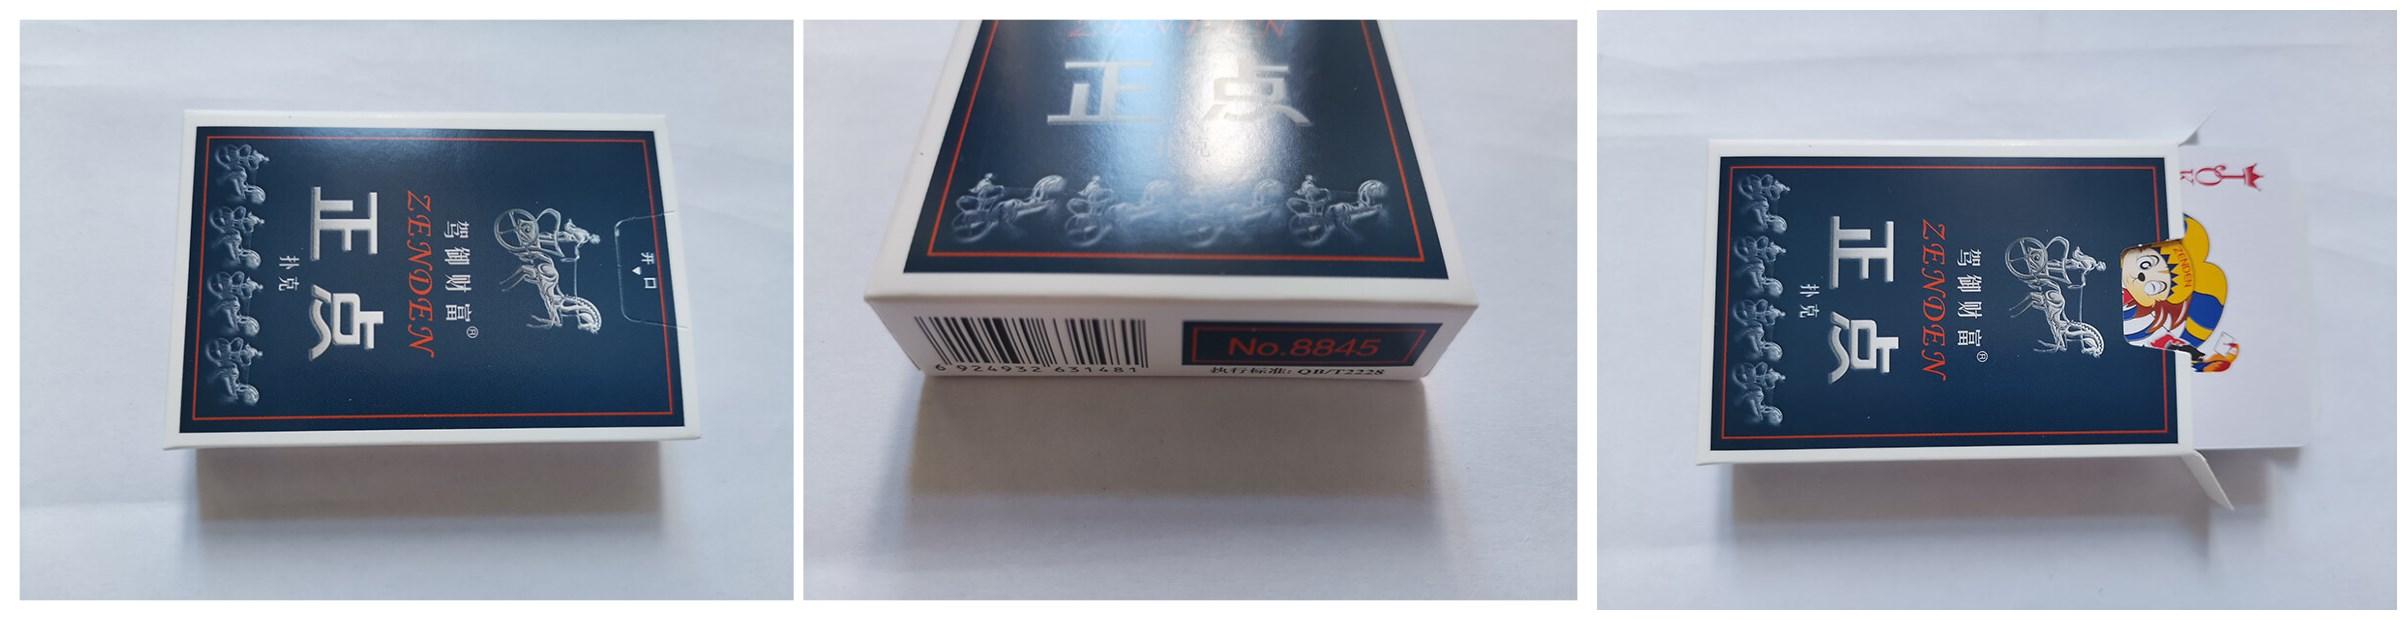 Play Card Cartoning Machine